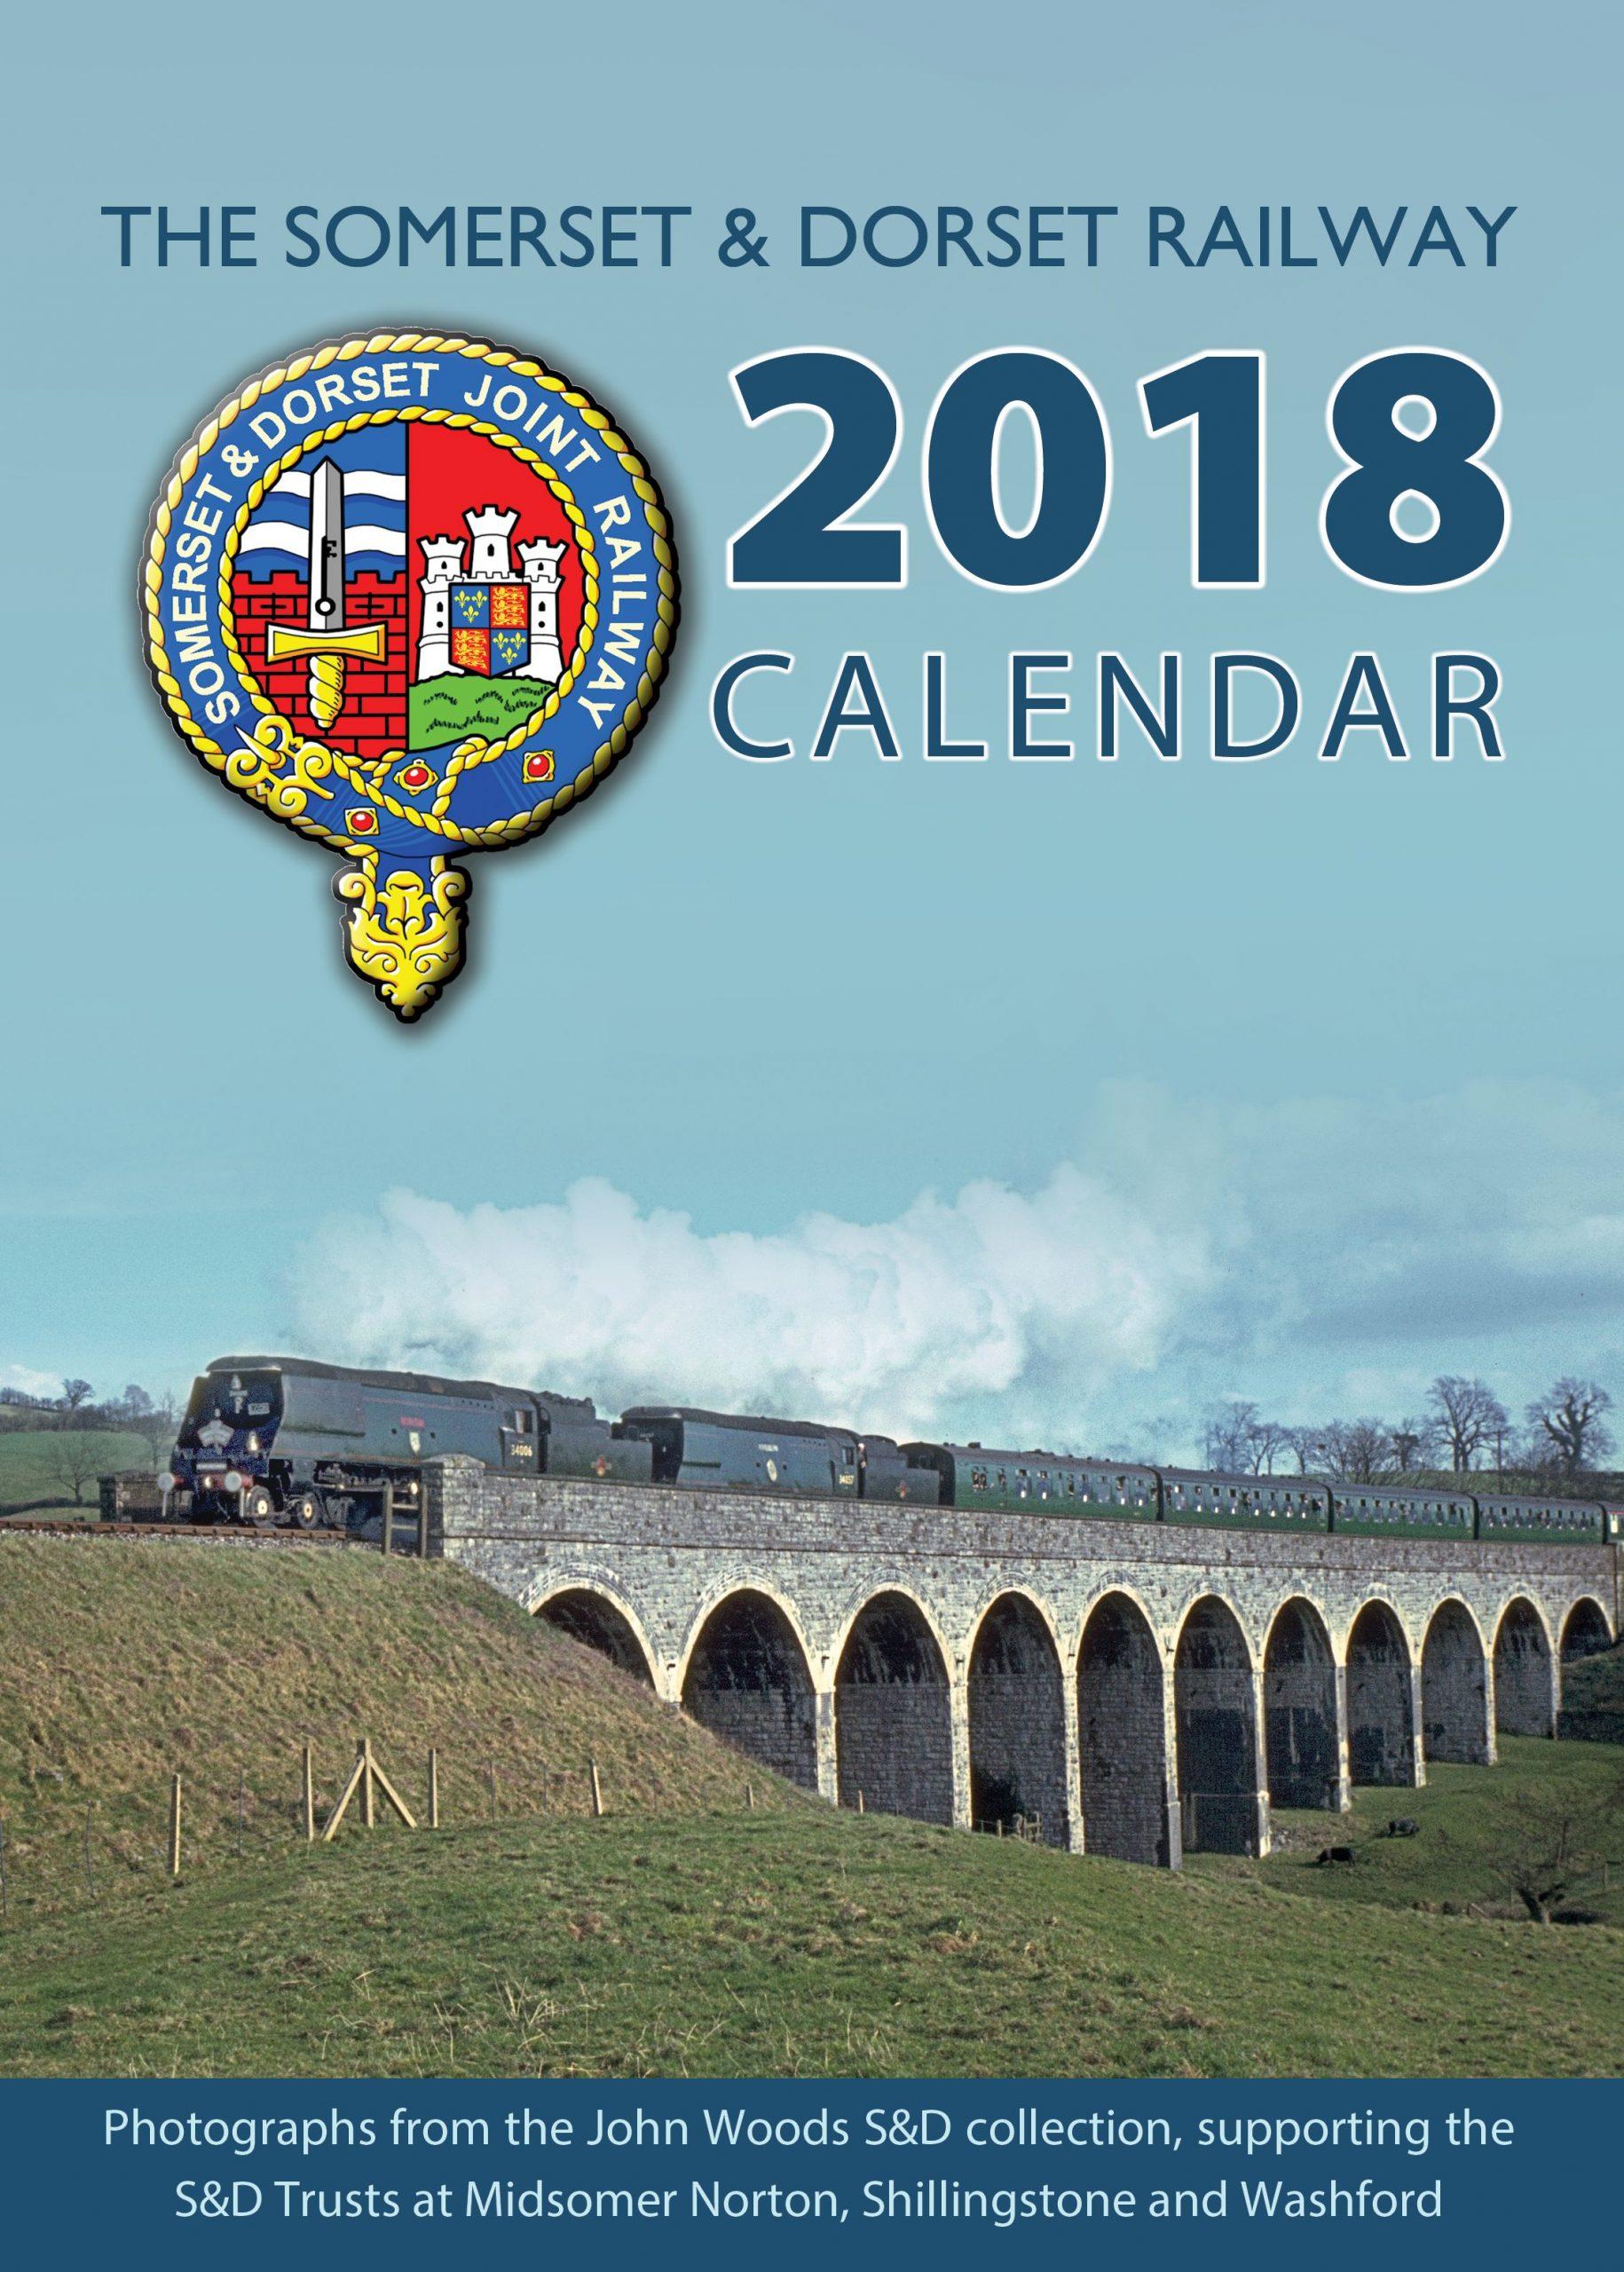 The S&DRT 2018 calendar